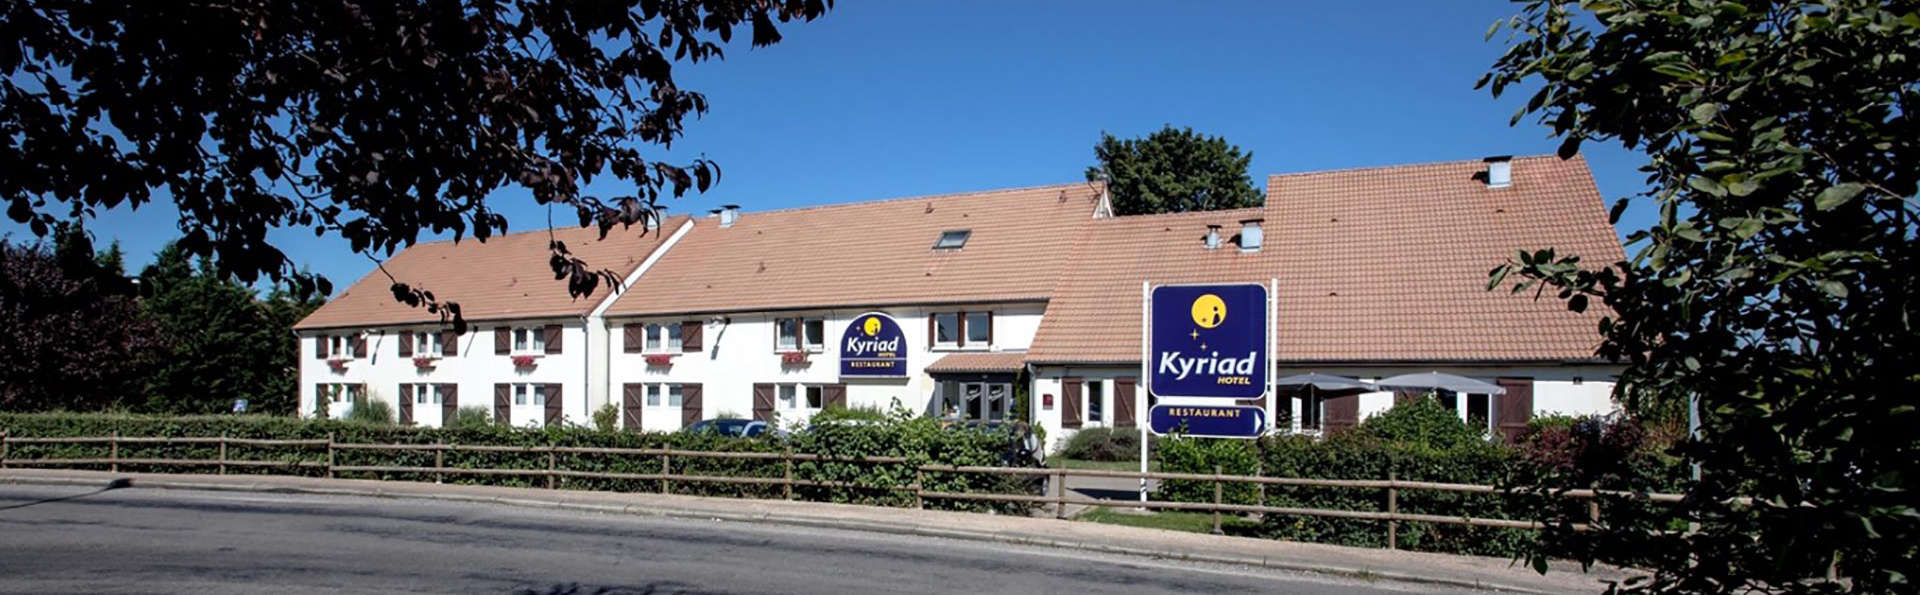 Hôtel Kyriad Mâcon Sancé - EDIT_front.jpg